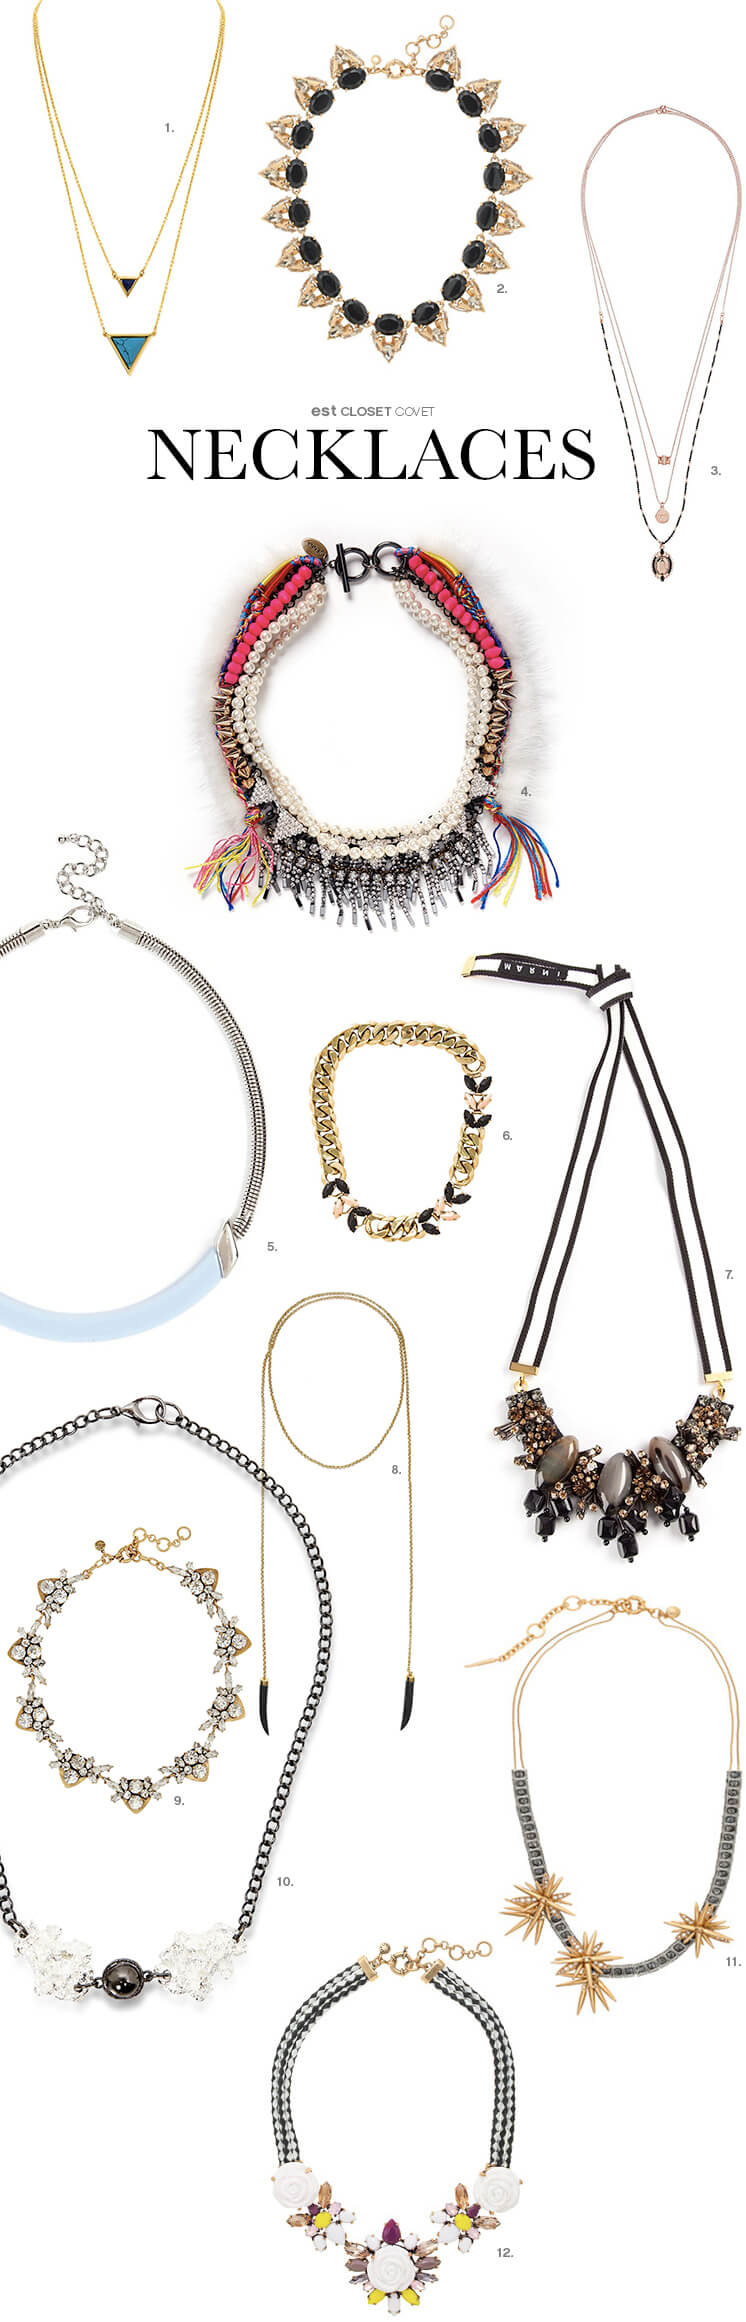 Closet-Covet-Necklaces-Est-Magazine